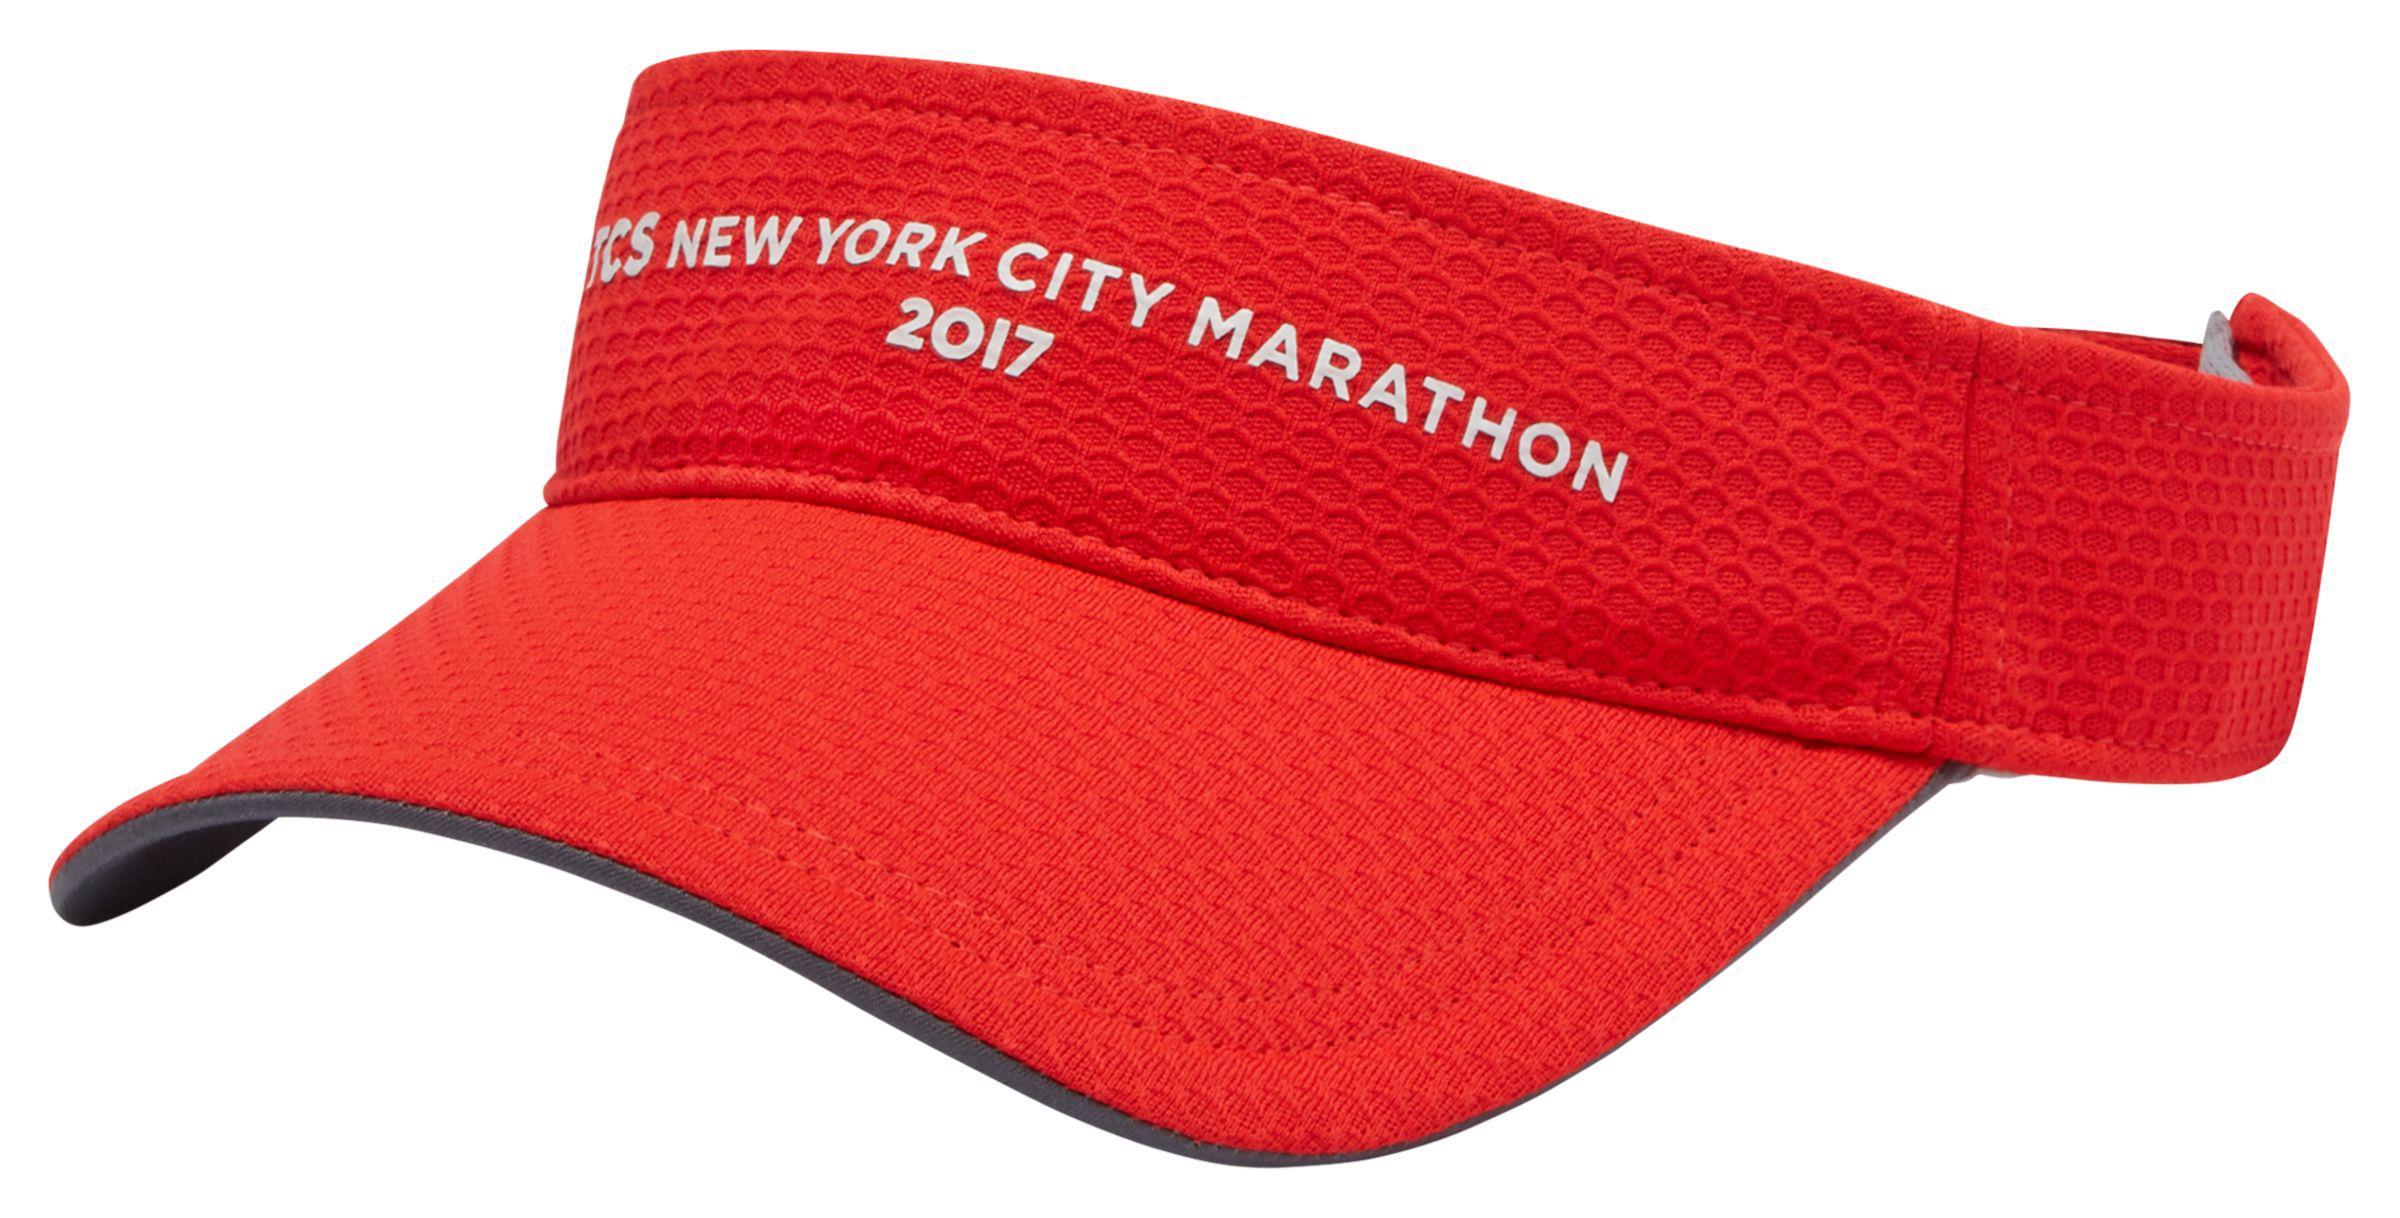 eb0b86a3653 Lyst - New Balance Nyc Marathon Performance Visor in Red for Men